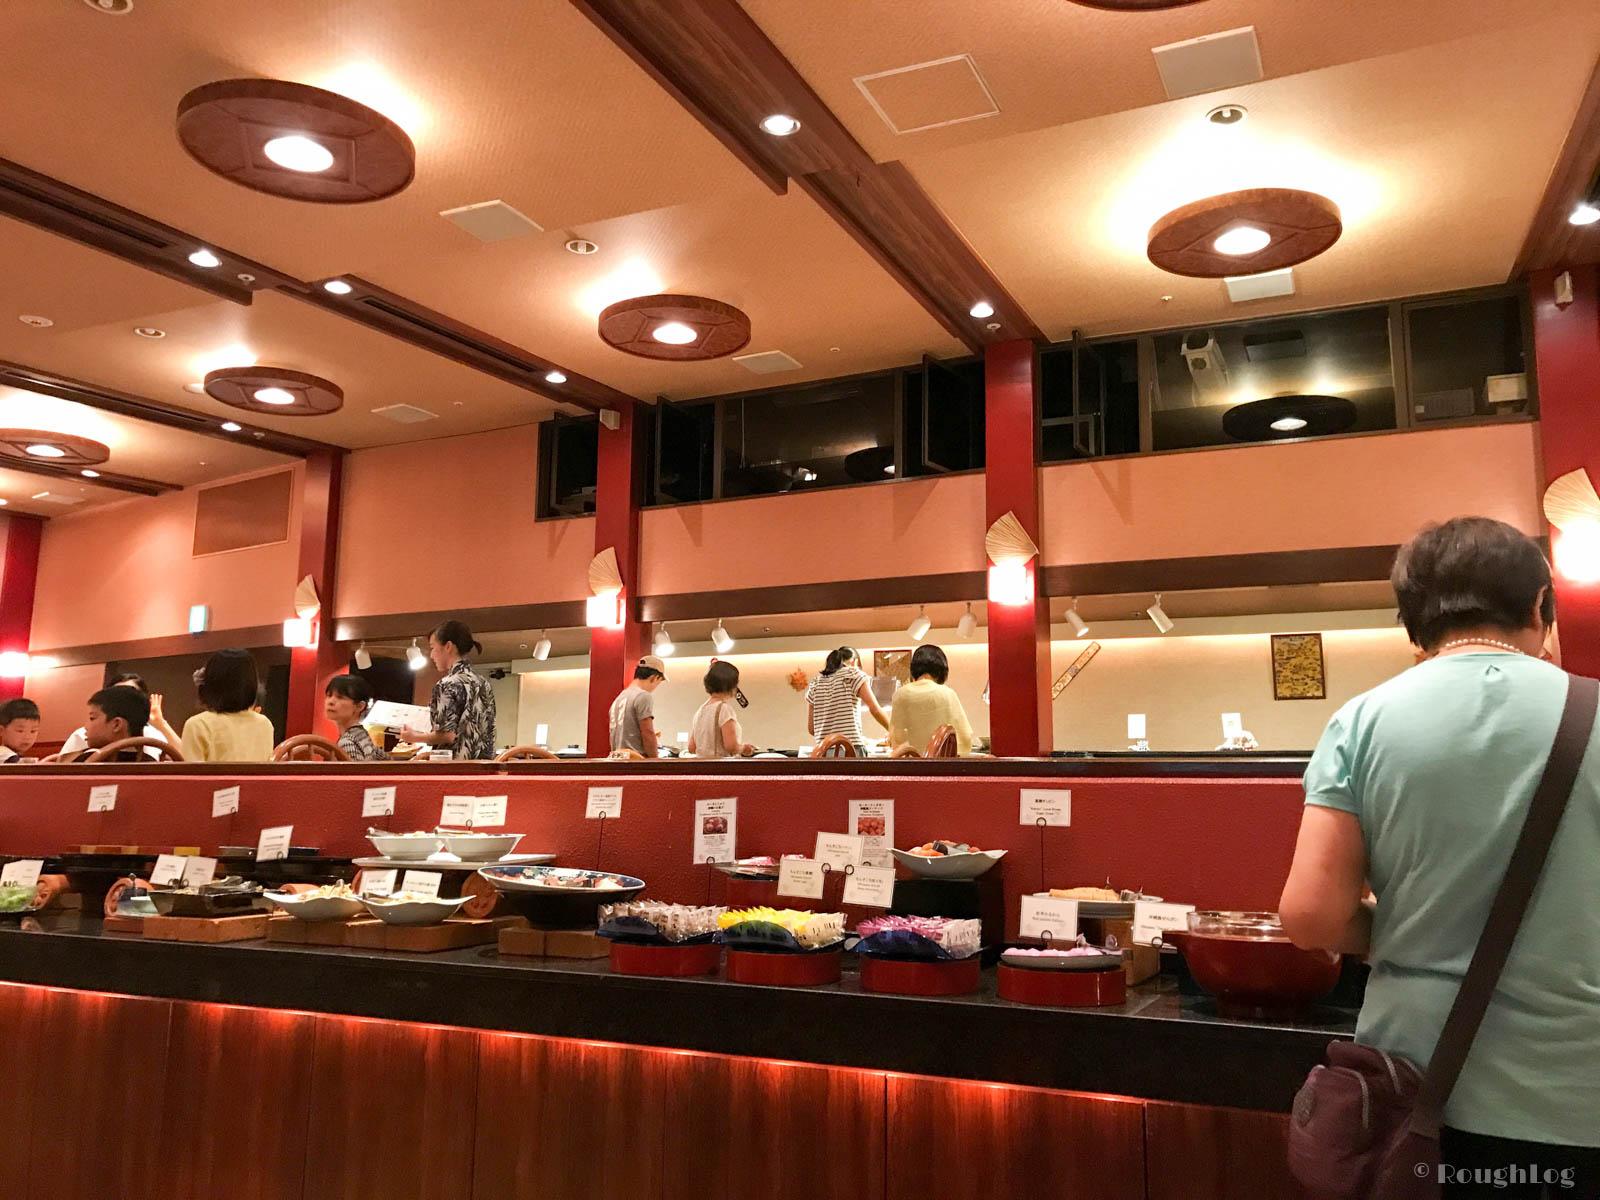 ANAインターコンチネンタル万座ビーチリゾート内のオーキッドで琉球芸能ショーを料理を食べながら楽しむ